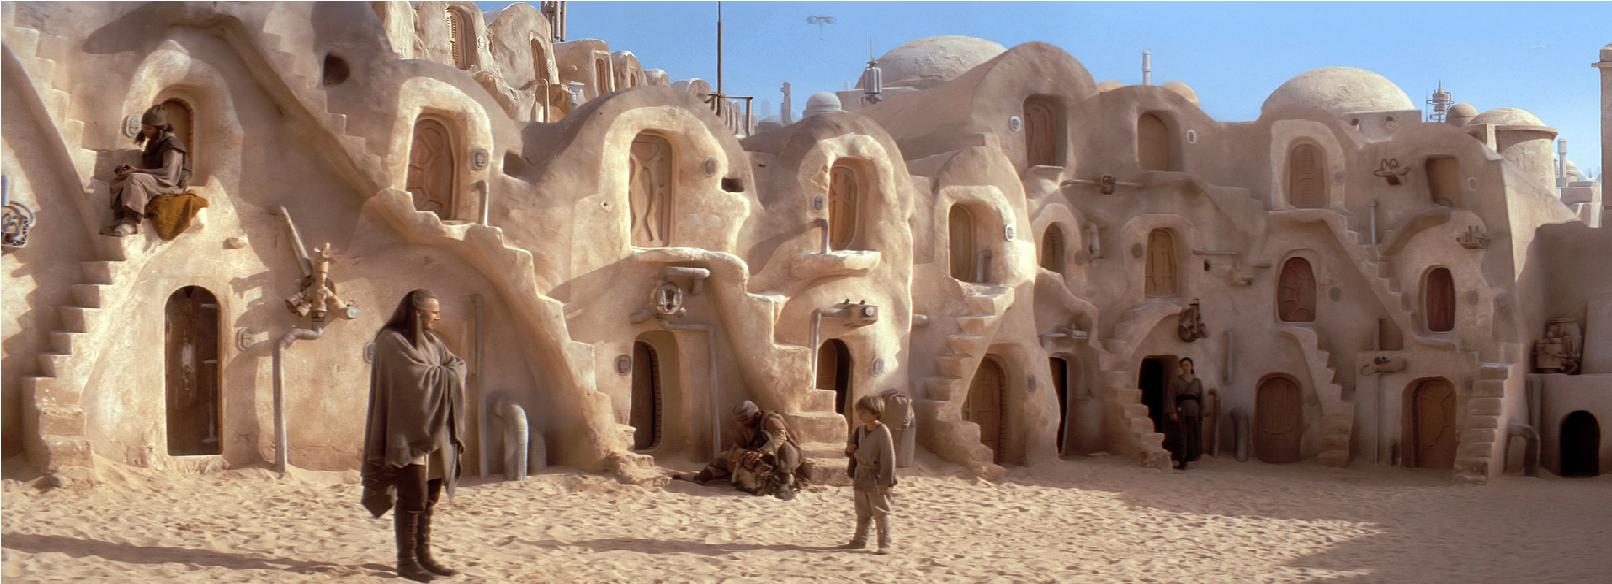 Anakins Star Wars